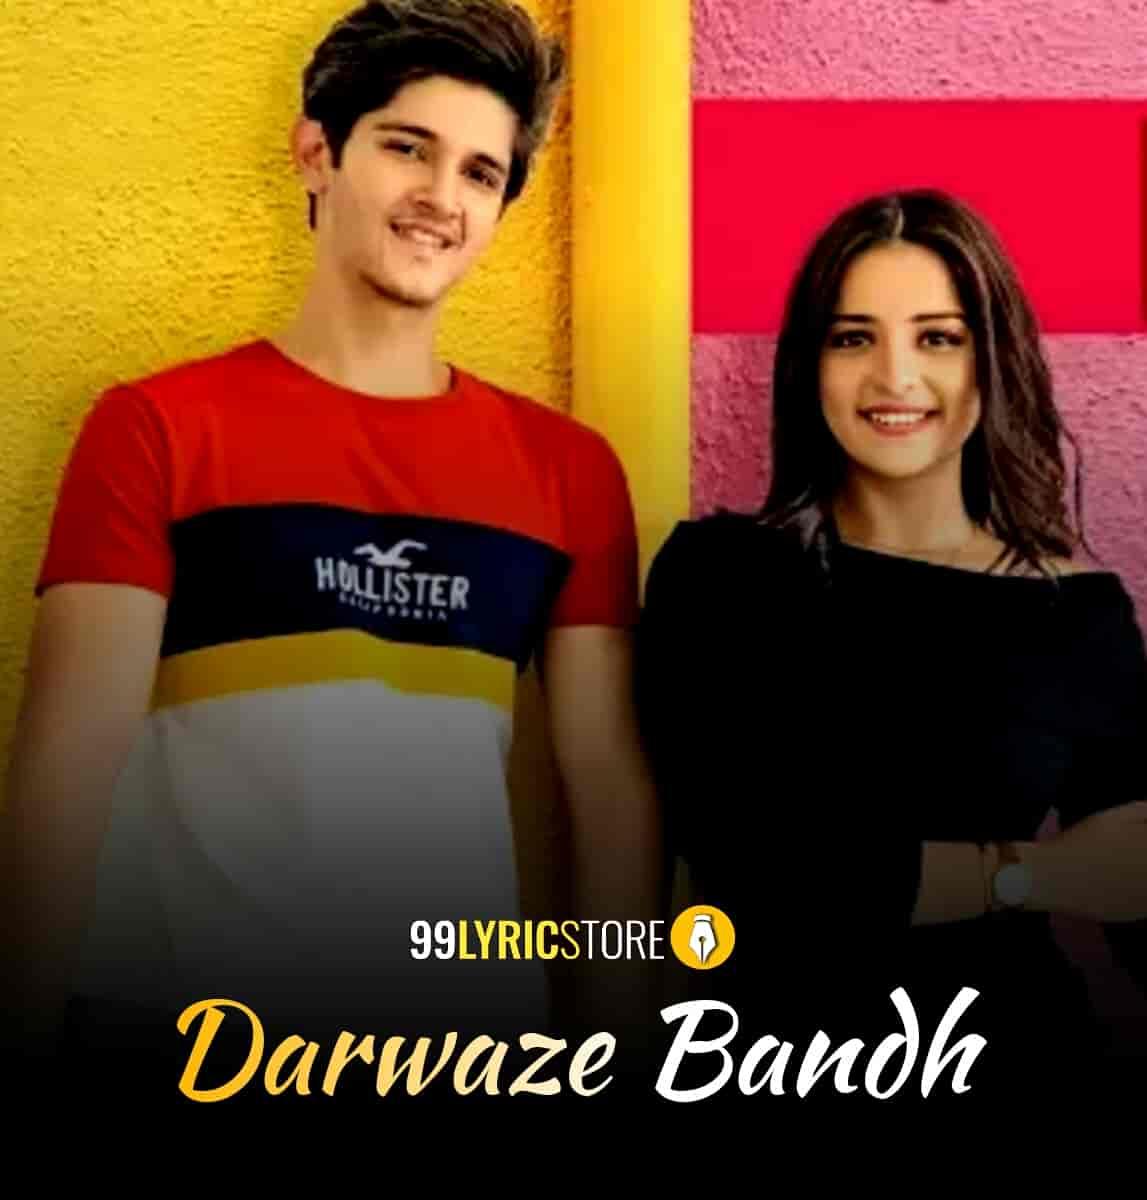 Darwaze Bandh Song images